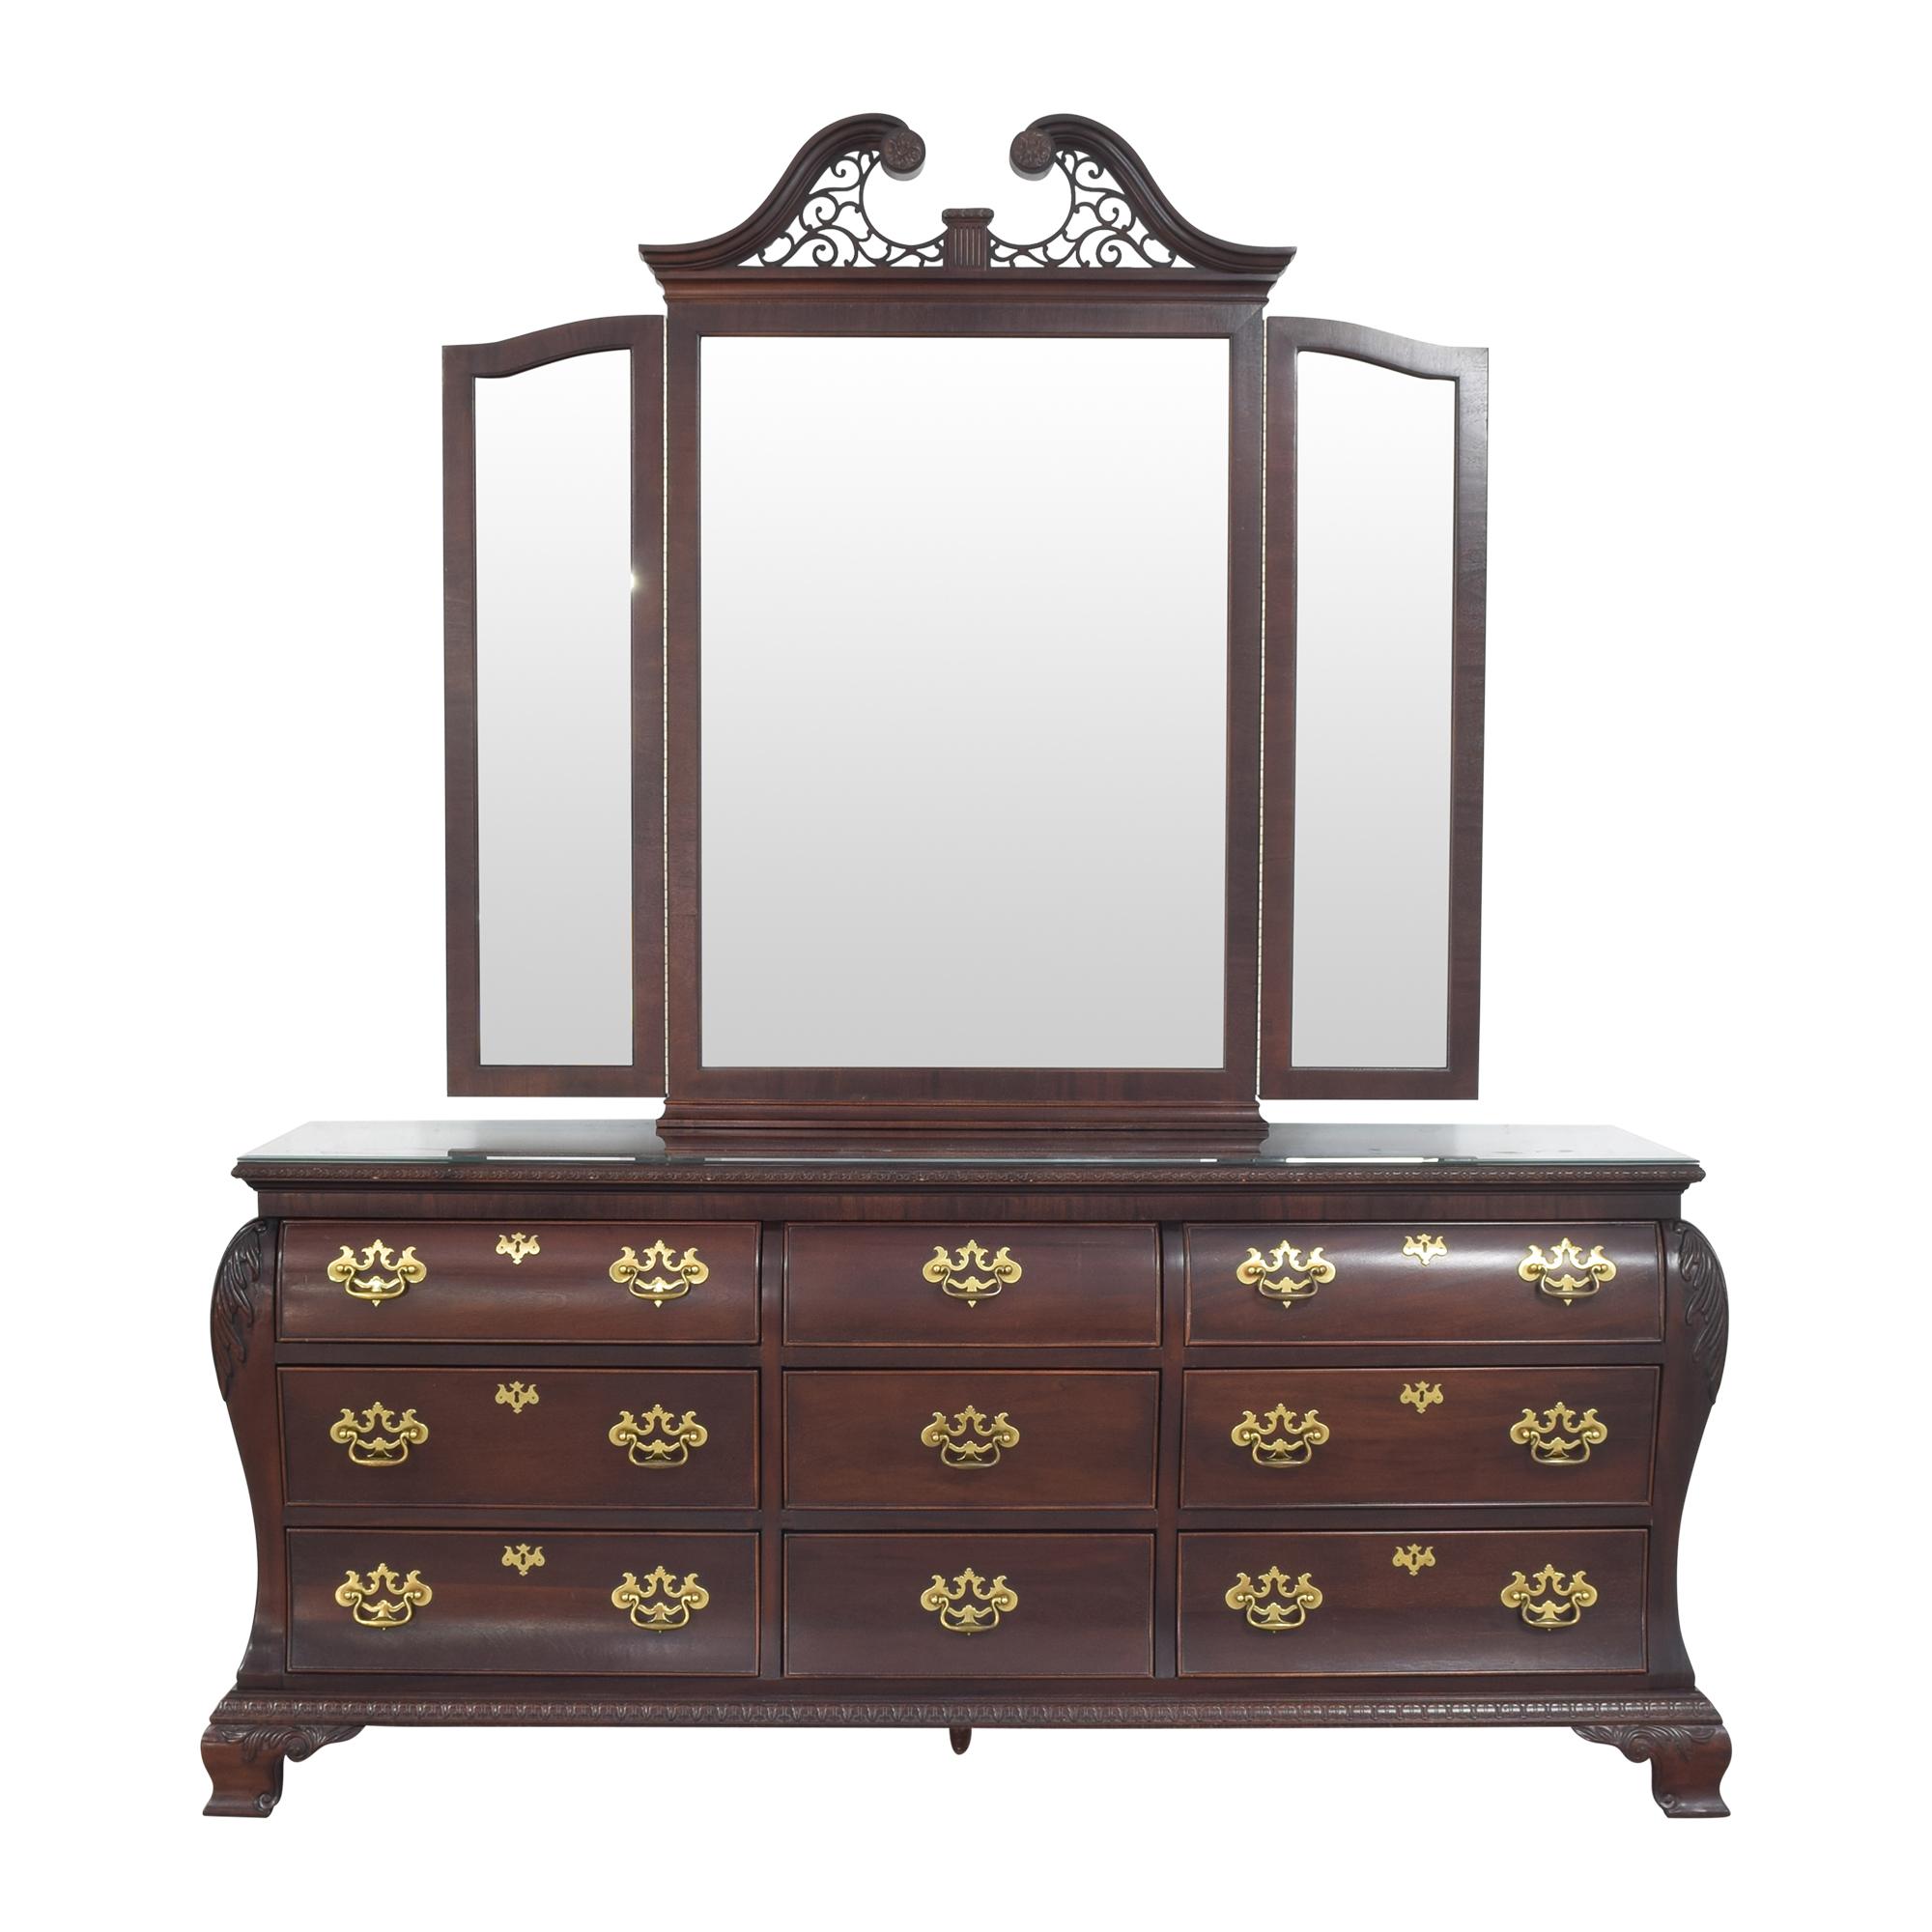 Century Furniture Century Triple Bombe Dresser and Mirror second hand